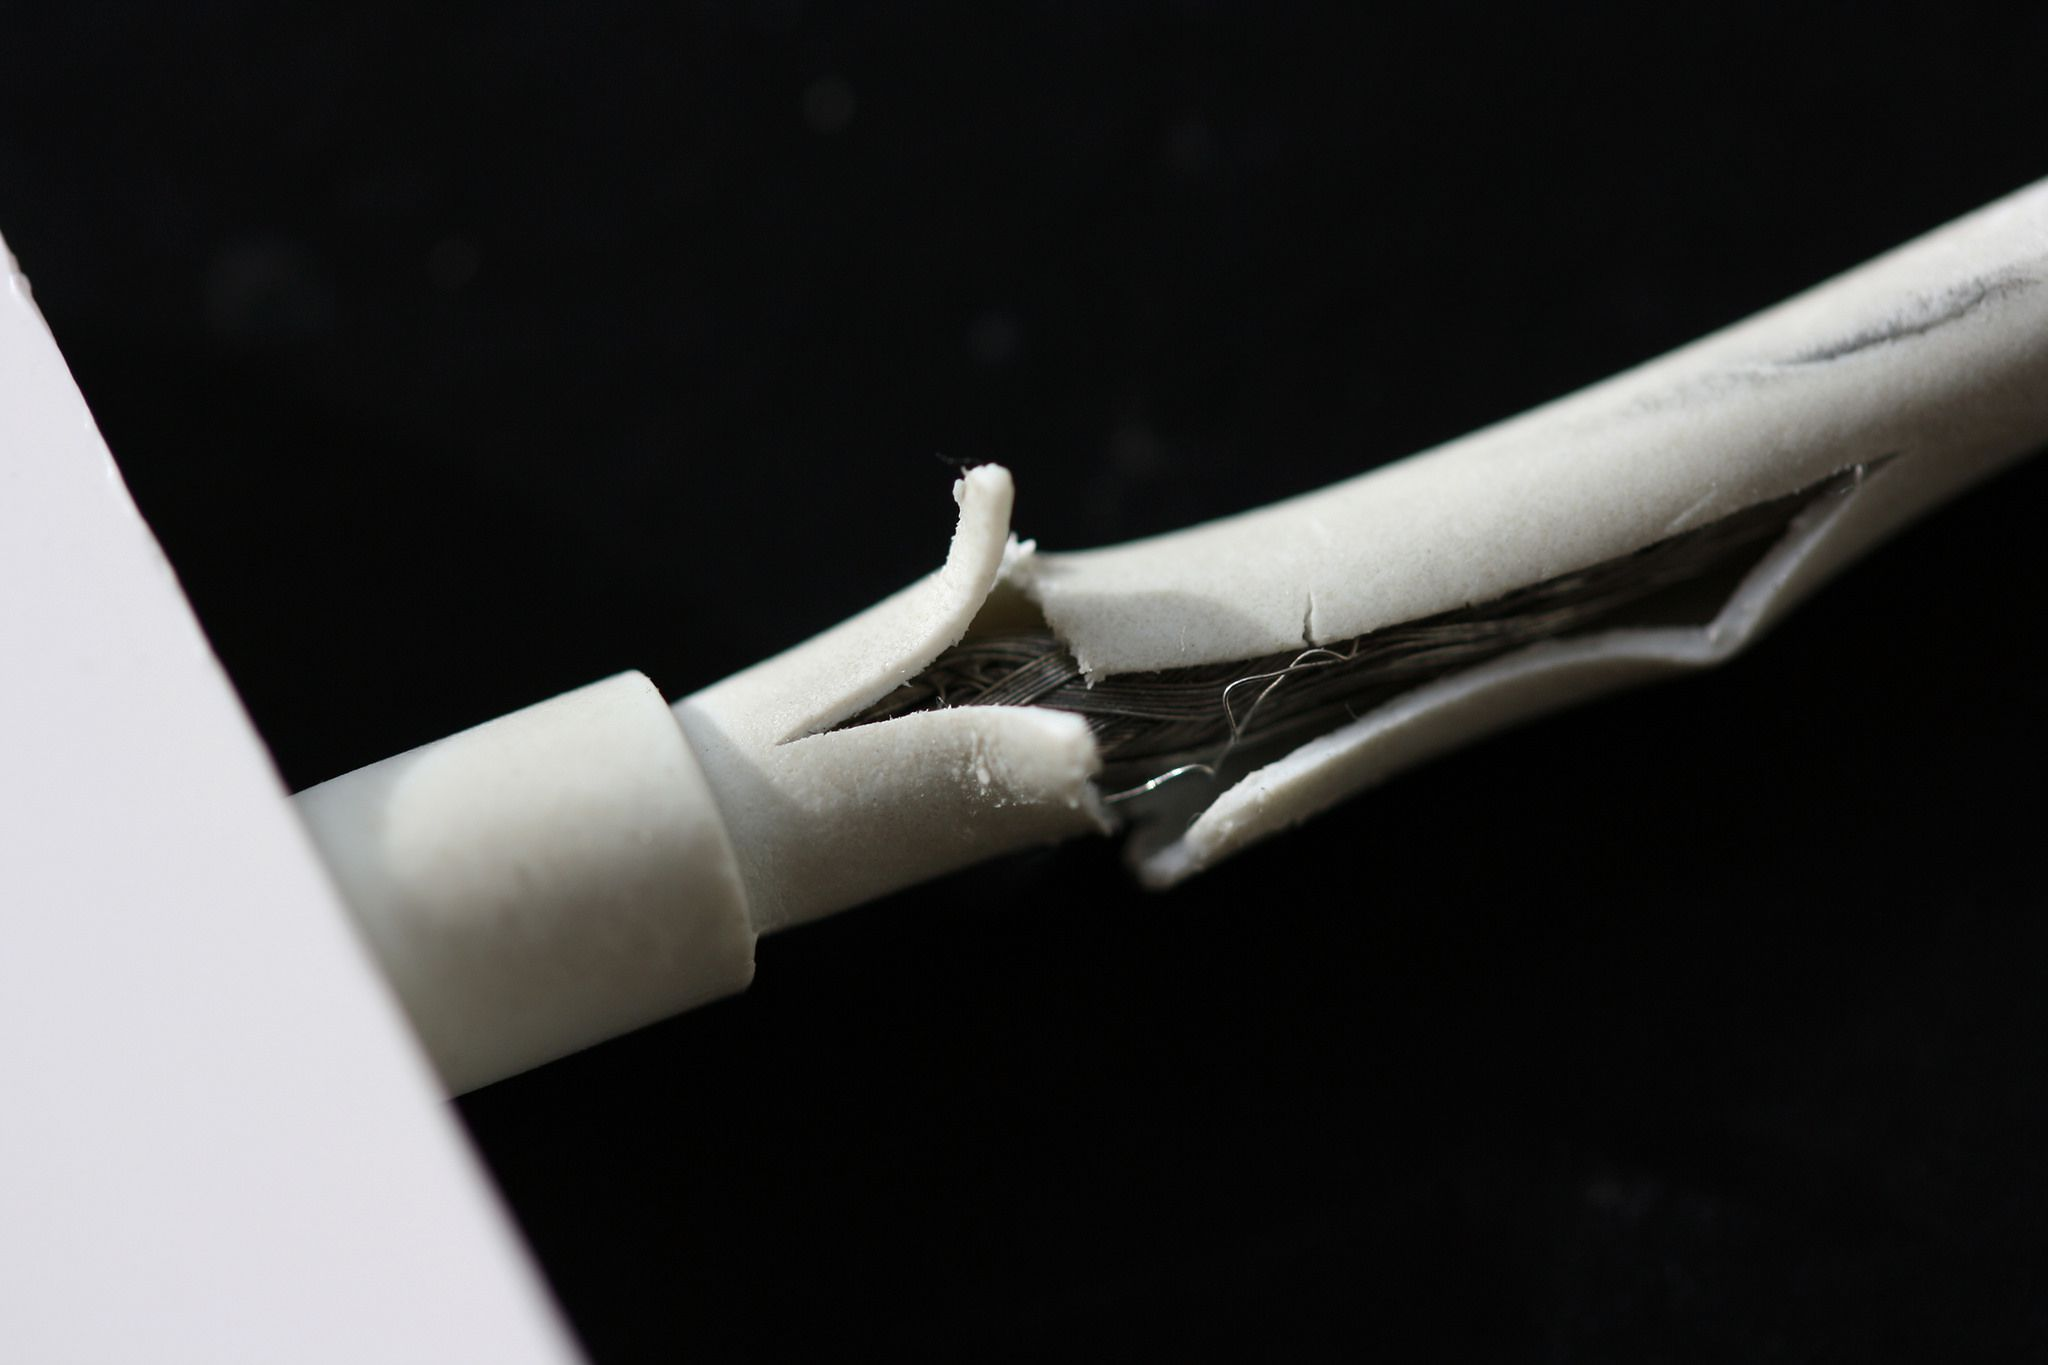 broken iphone cable